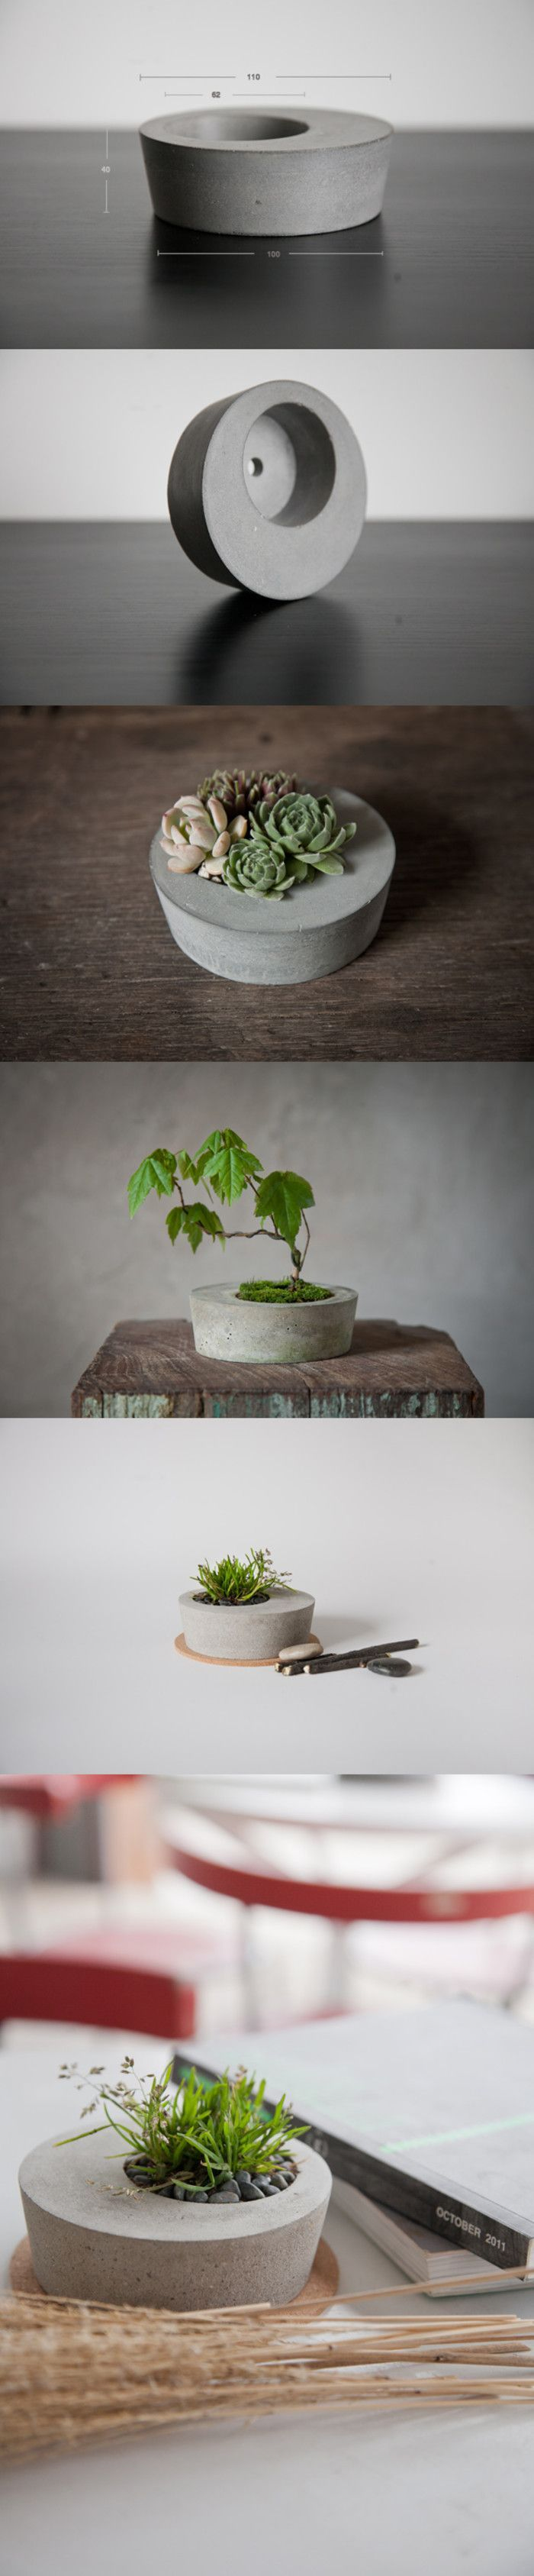 Small concrete planter concrete projects pinterest for Small concrete projects